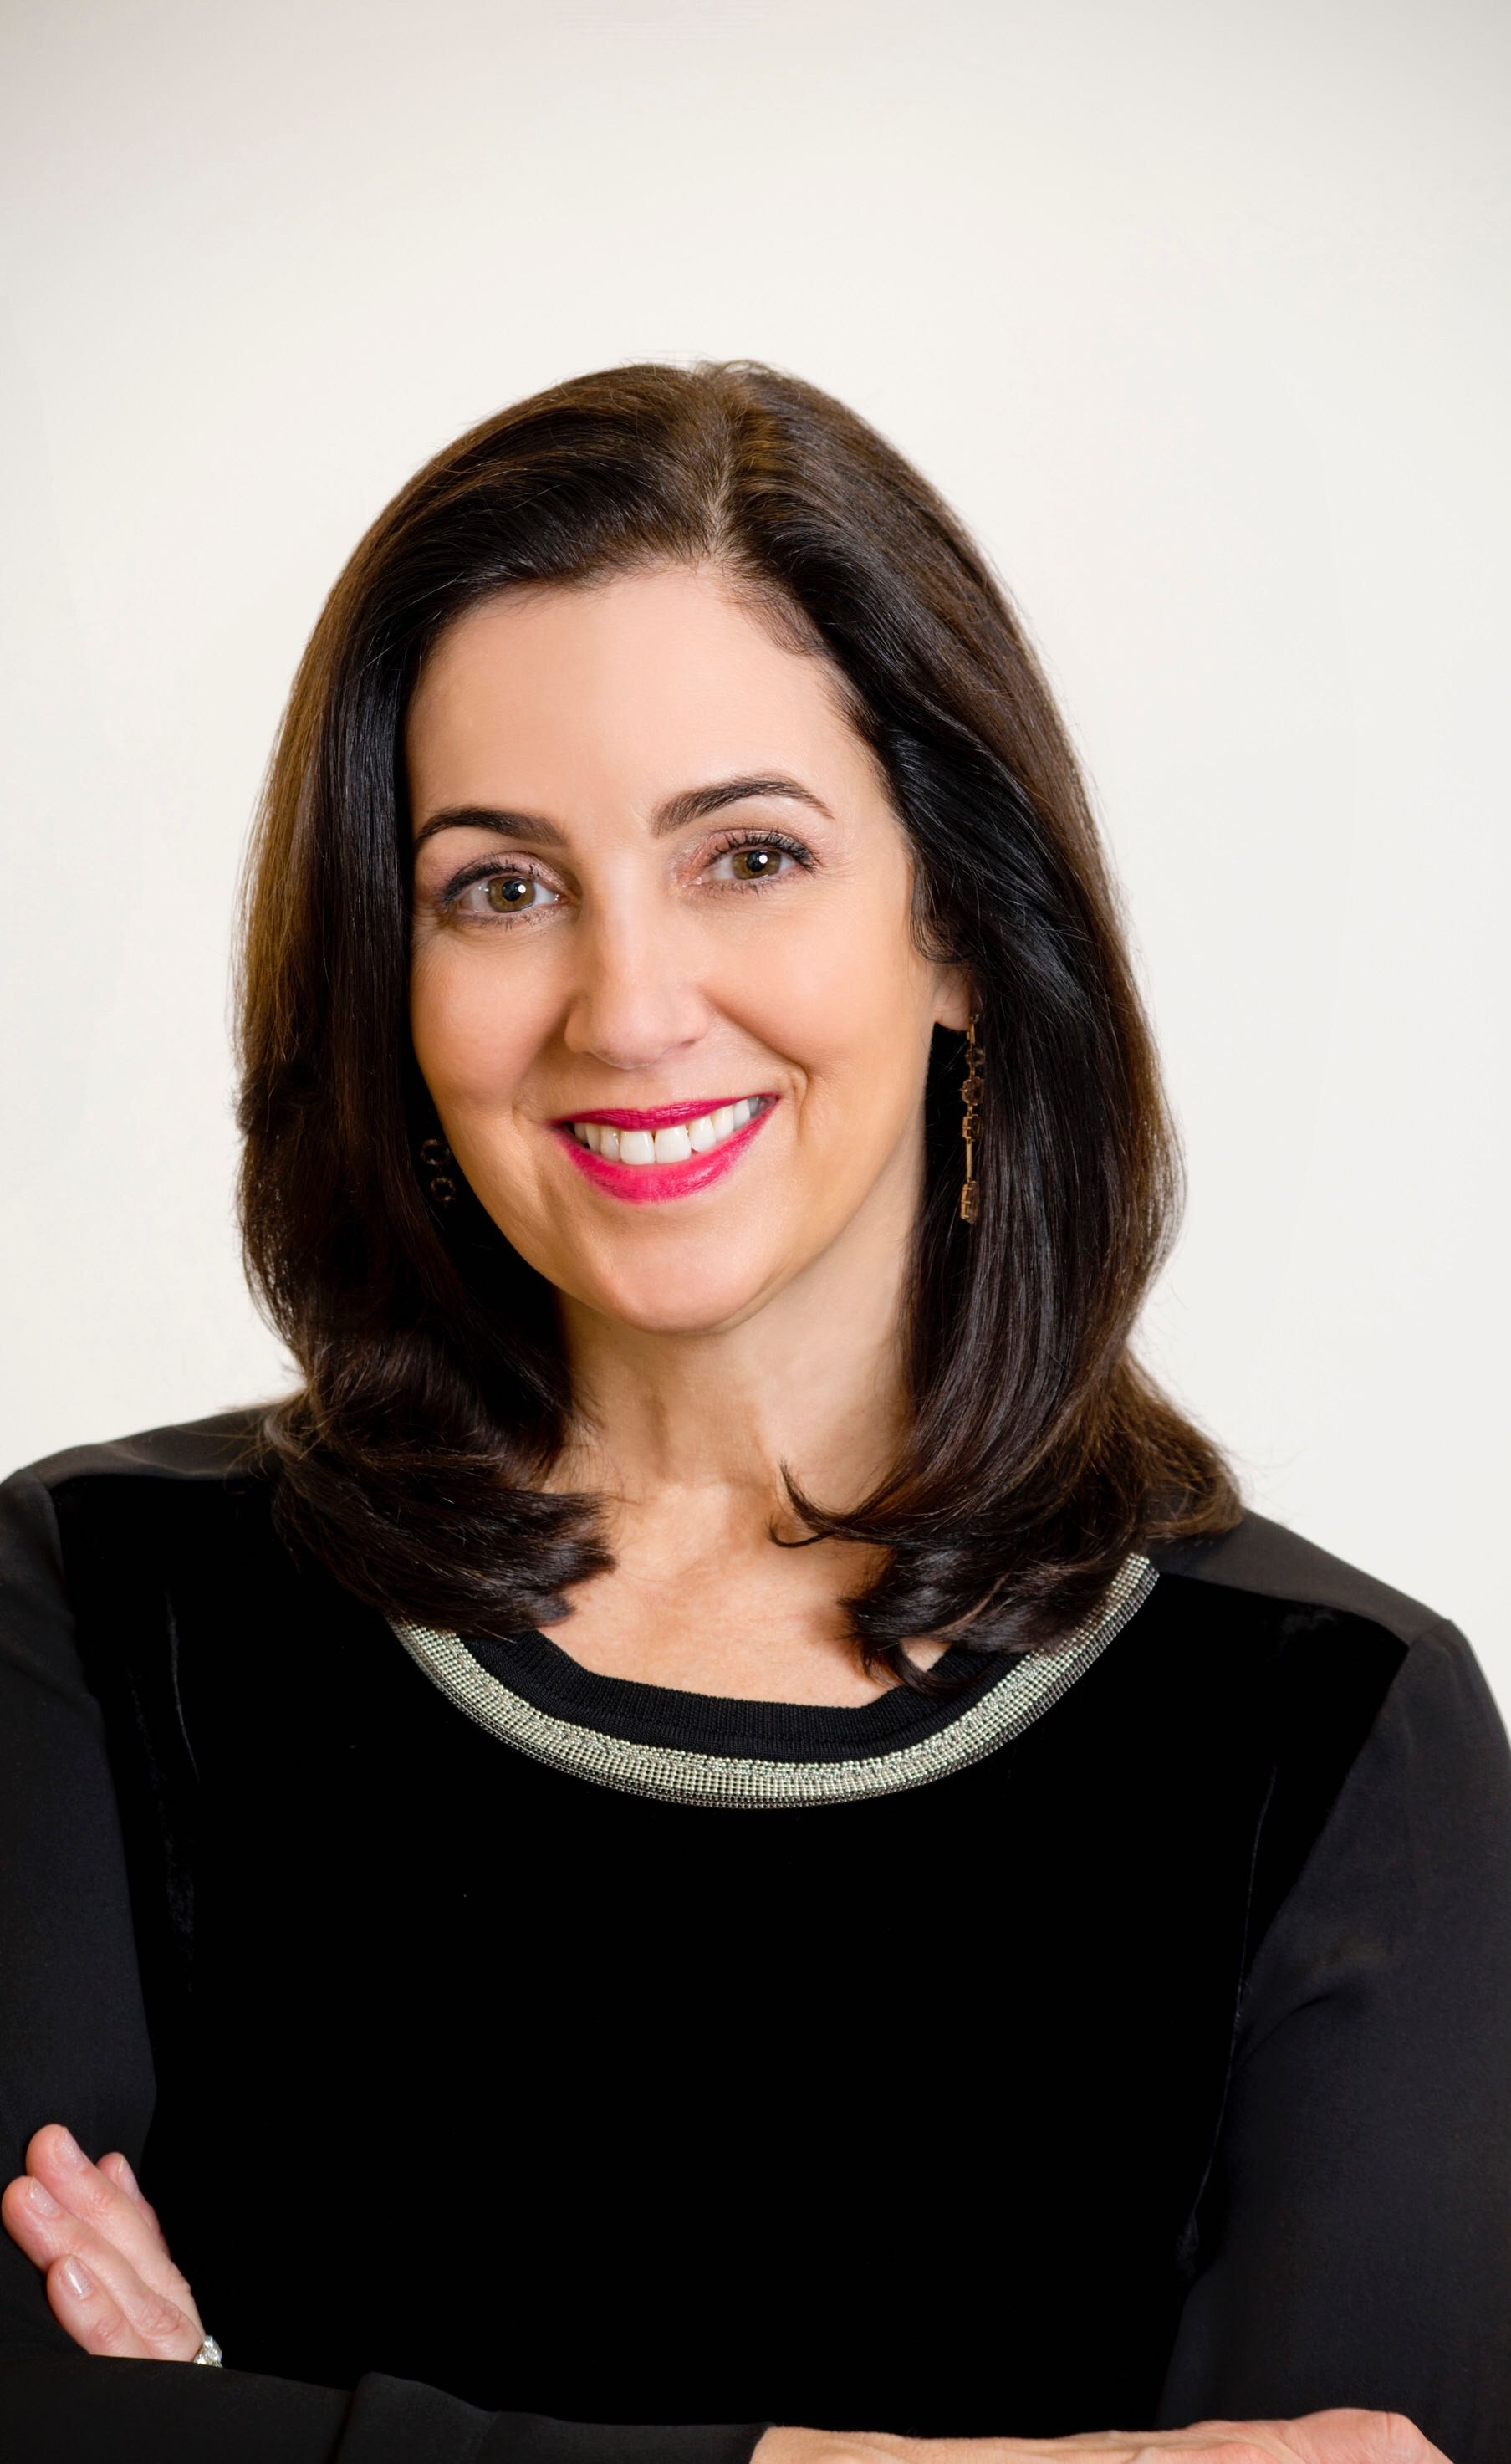 Joanna Shields BenevolentAI